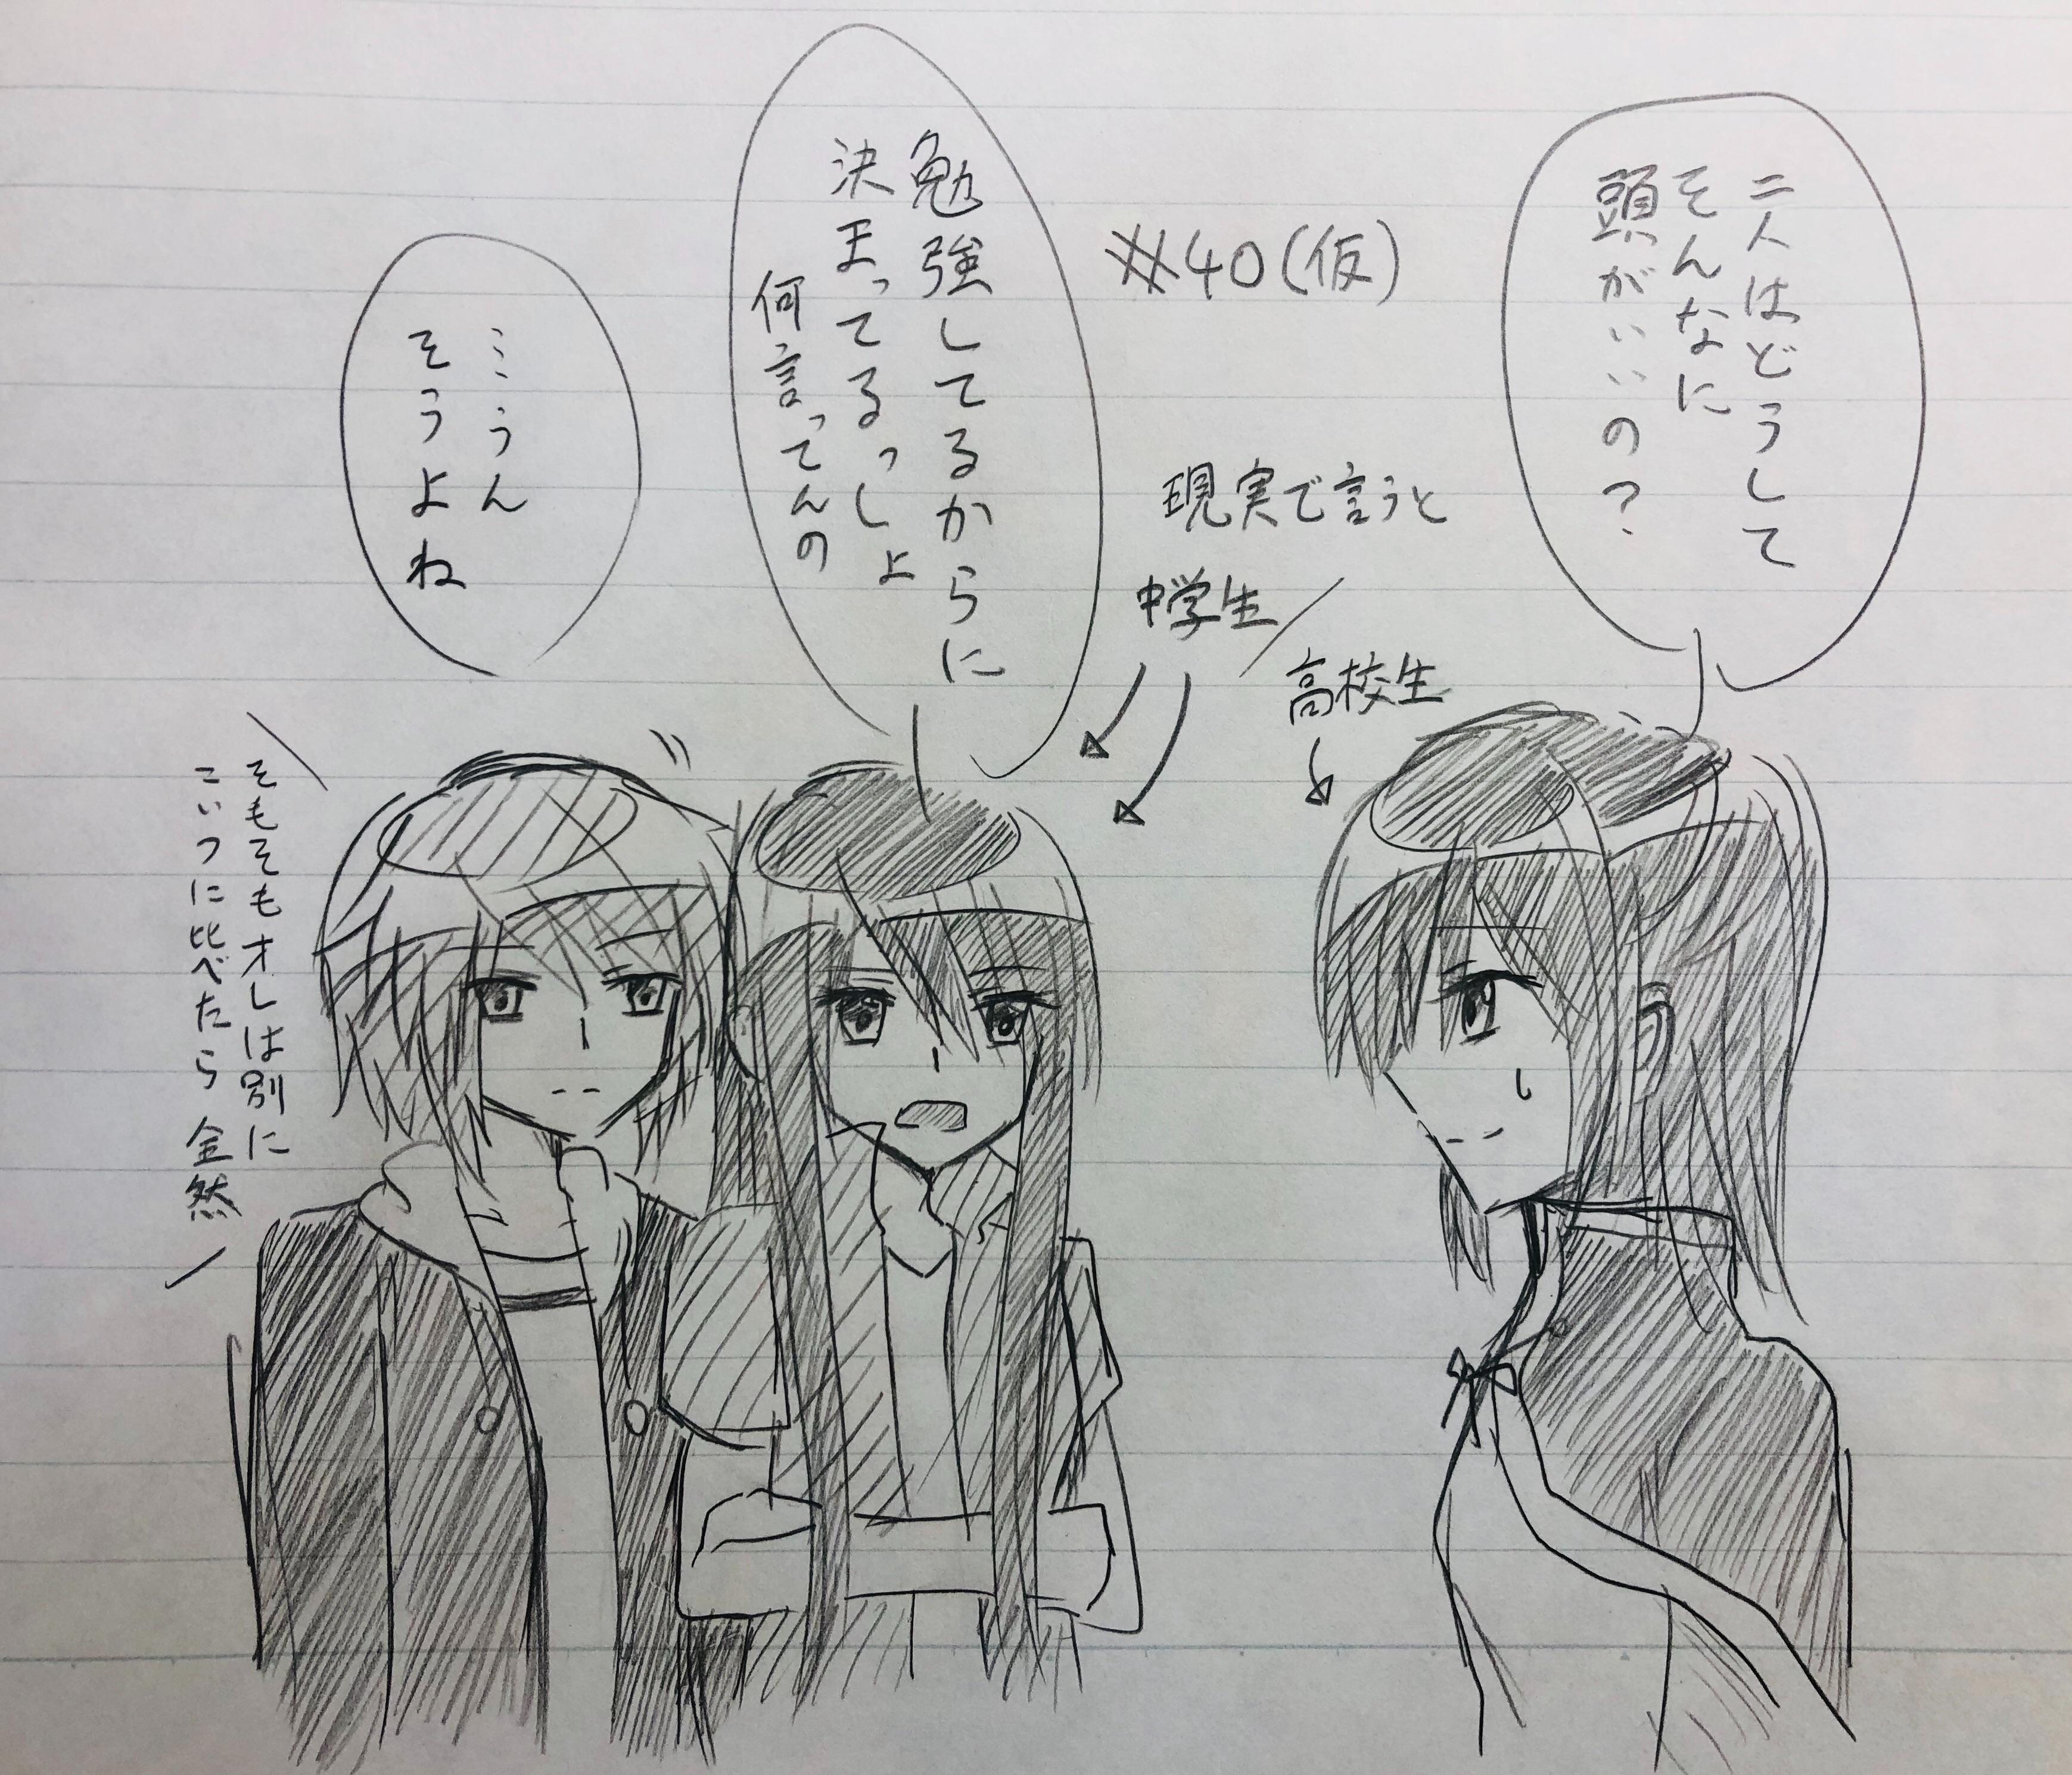 f:id:Yuki-19:20200127153401j:image